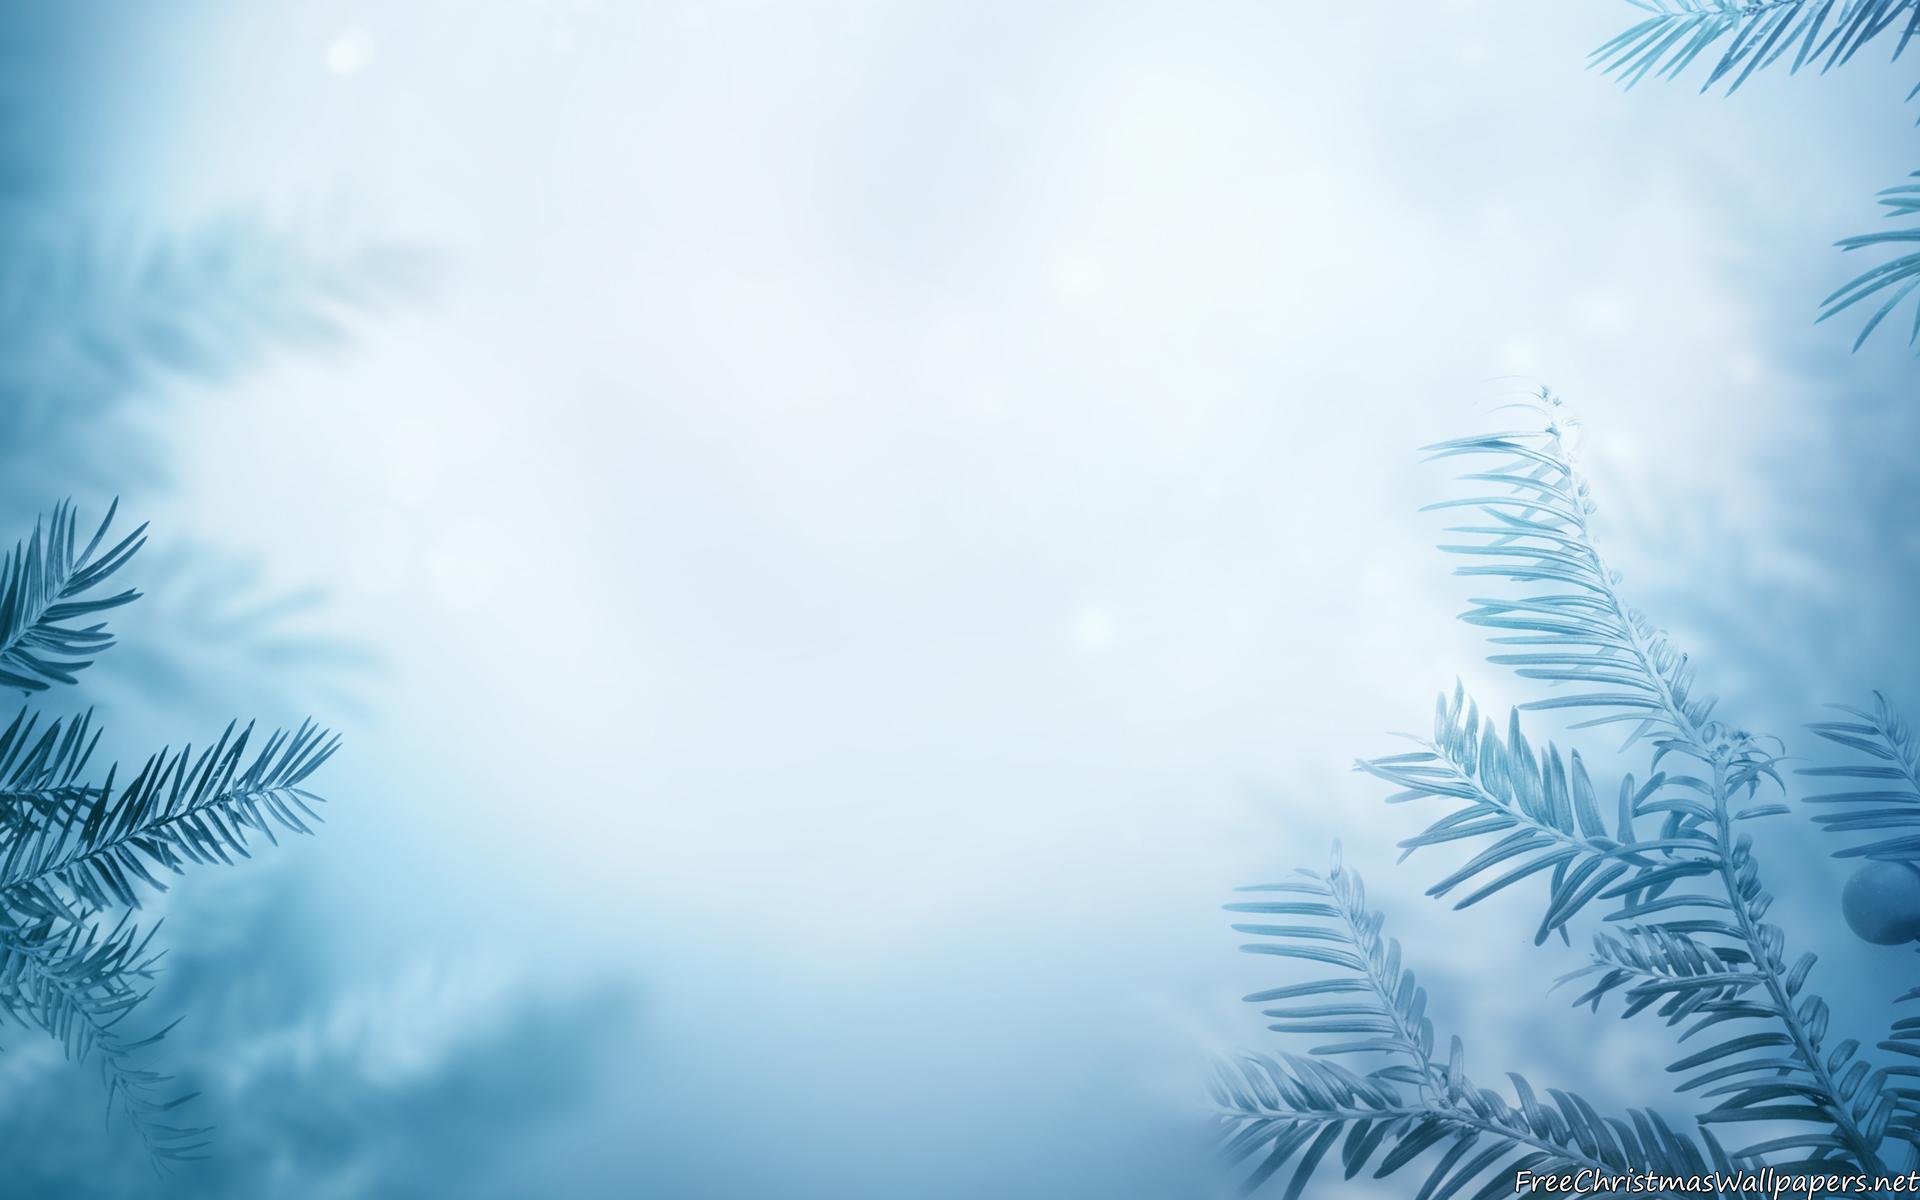 Winter Background wallpaper 1920x1200 81016 1920x1200